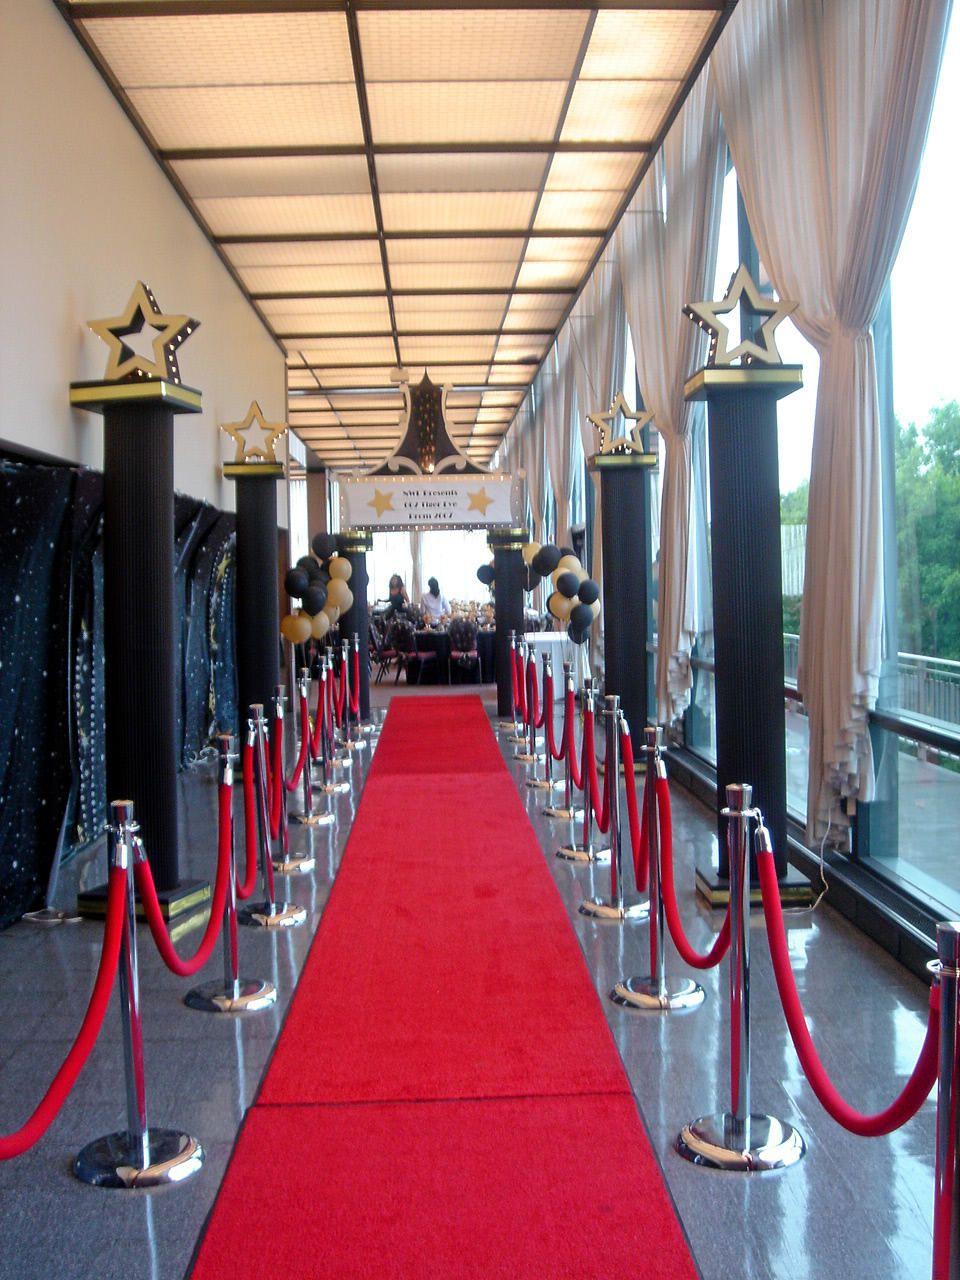 Prom Entrance Idea Red Carpet Prom Theme Red Carpet Entrance